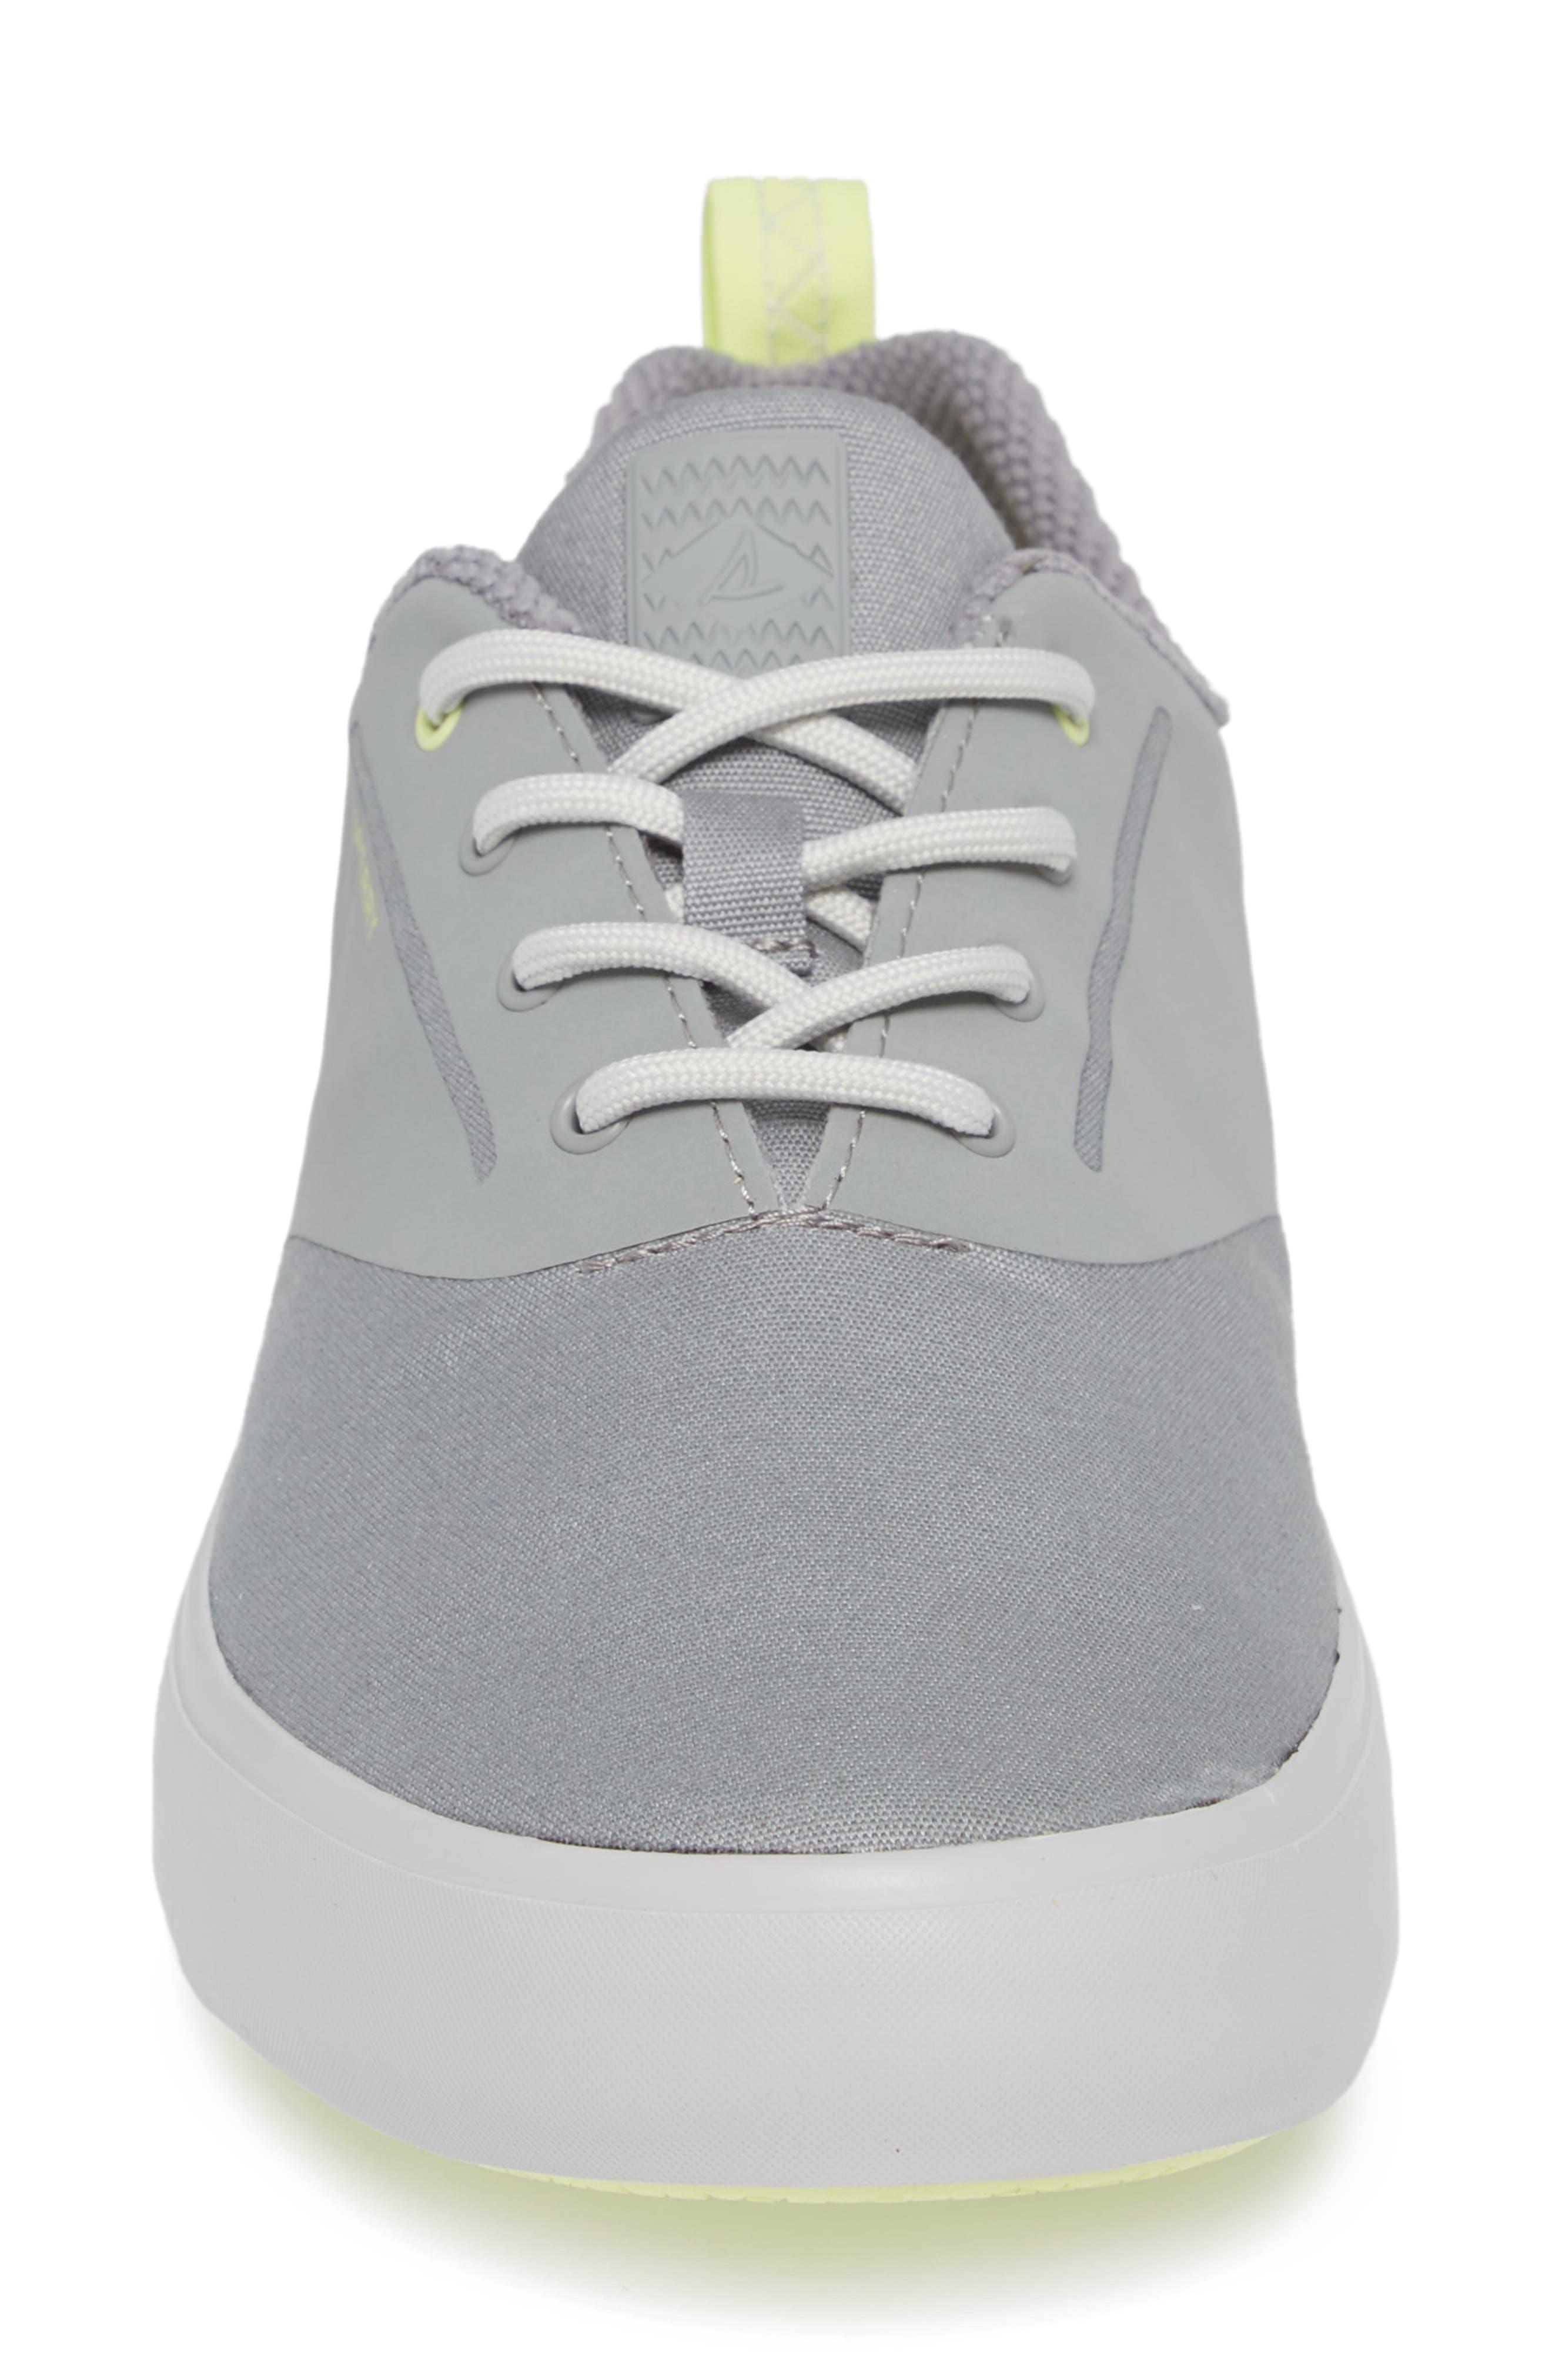 SPERRY, Flex Deck CVO Sneaker, Alternate thumbnail 4, color, GREY